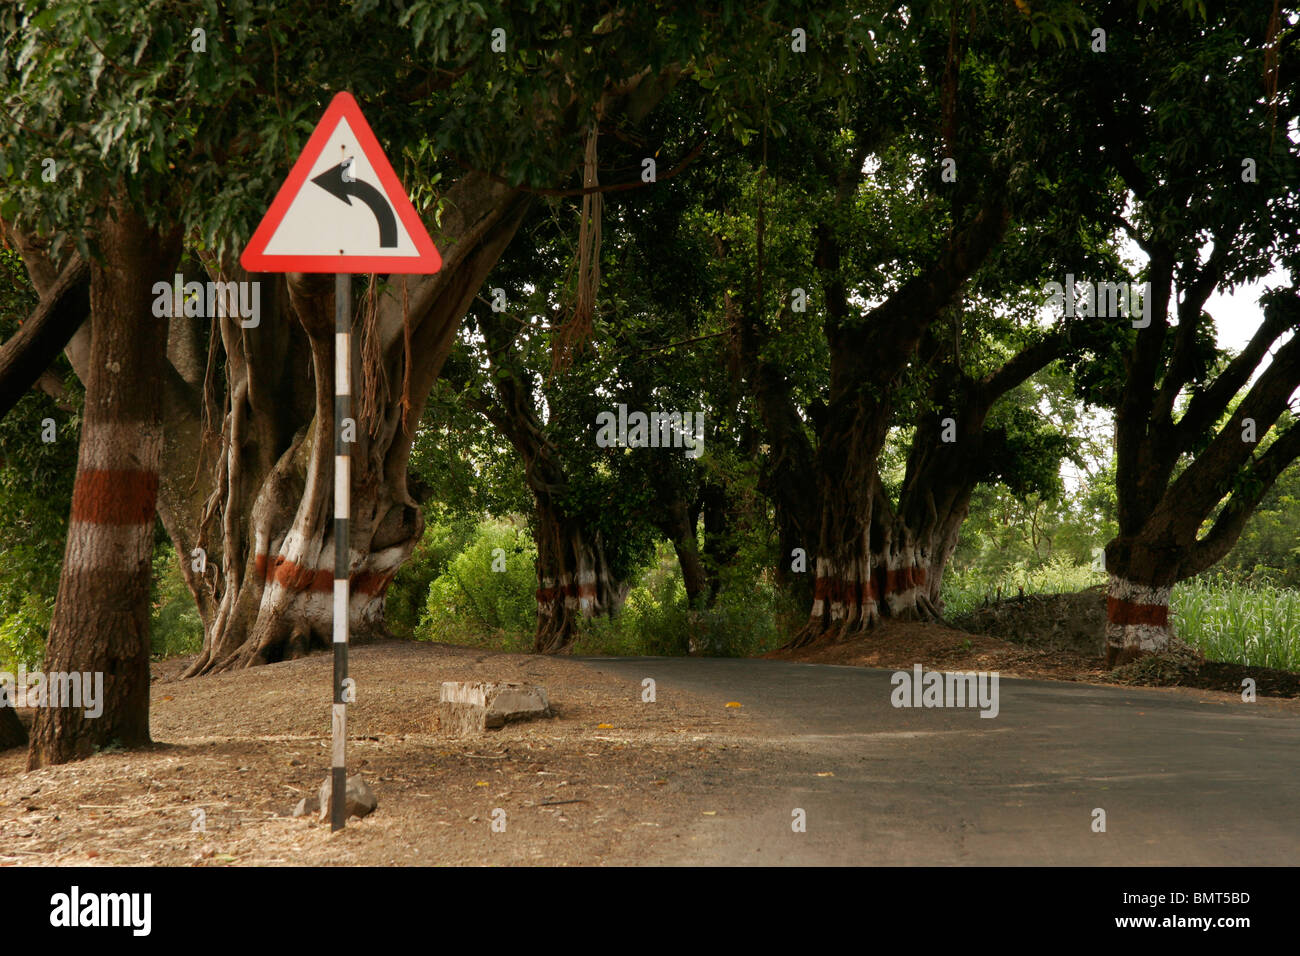 Señal de carretera que indica la izquierda en el camino de la WAI; Maharashtra, India Foto de stock